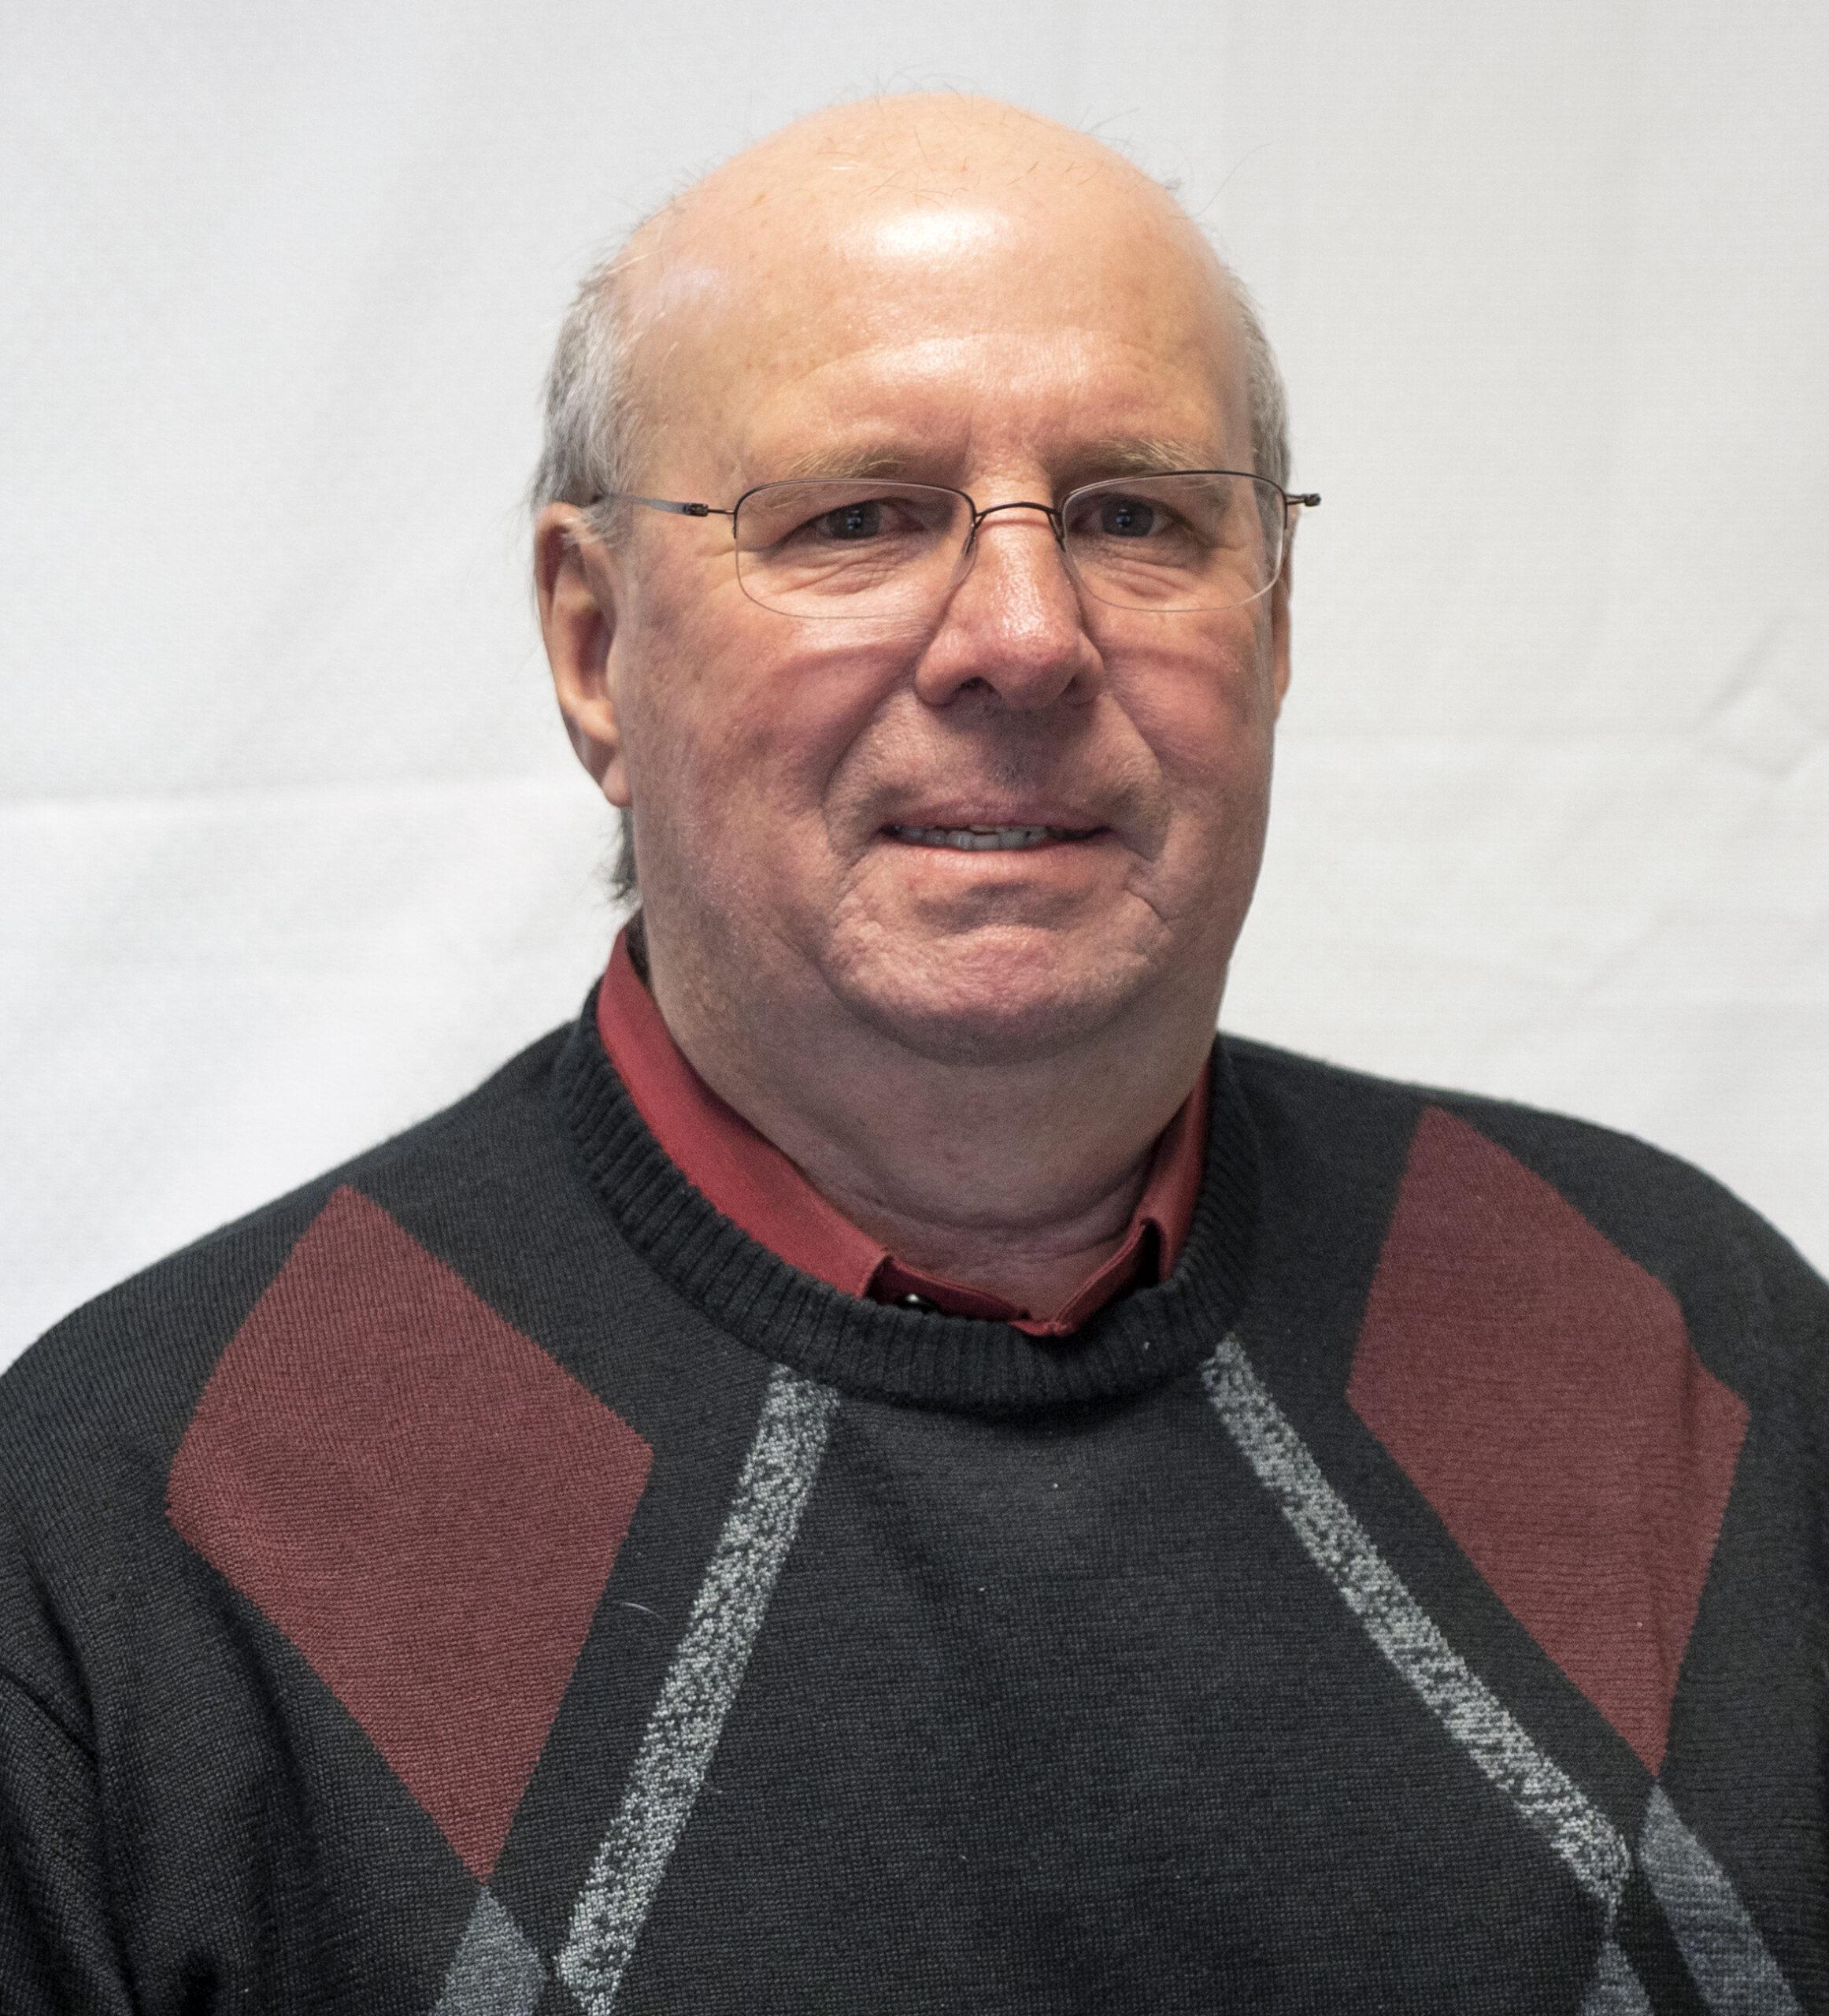 Jerry Janssen